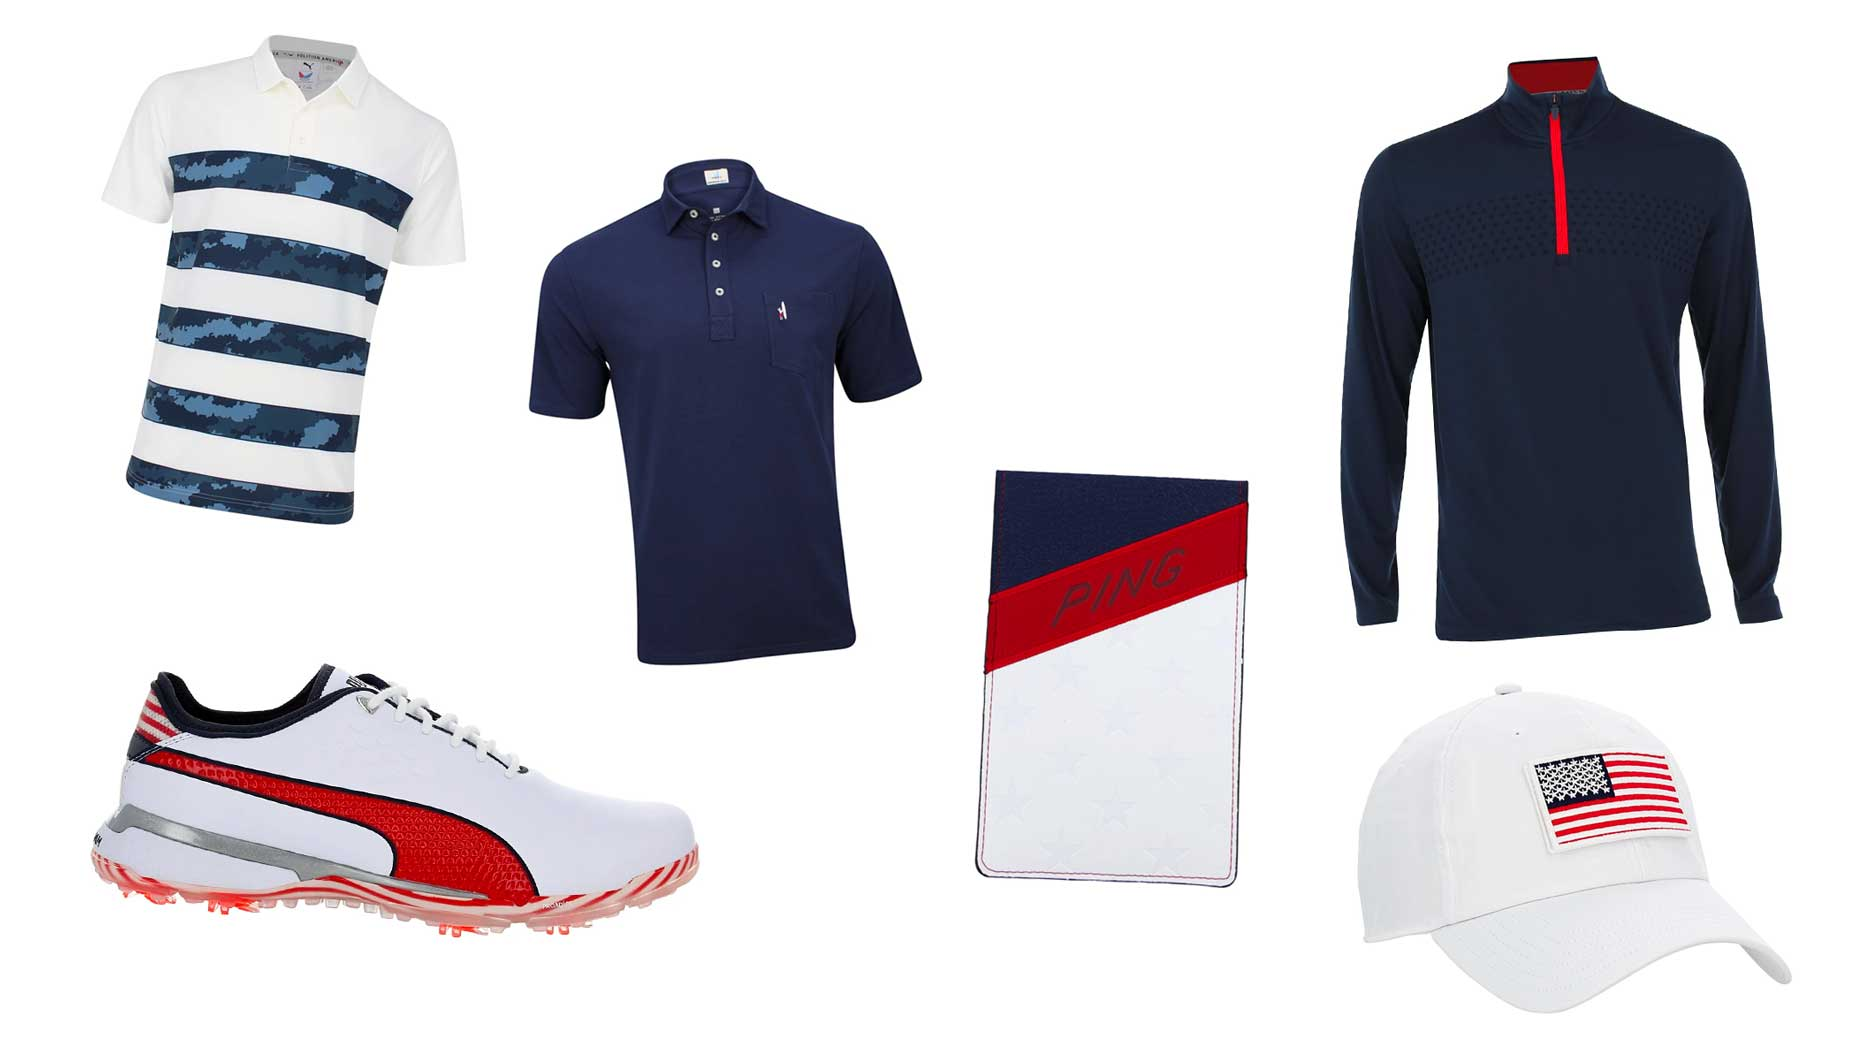 USA golf gear